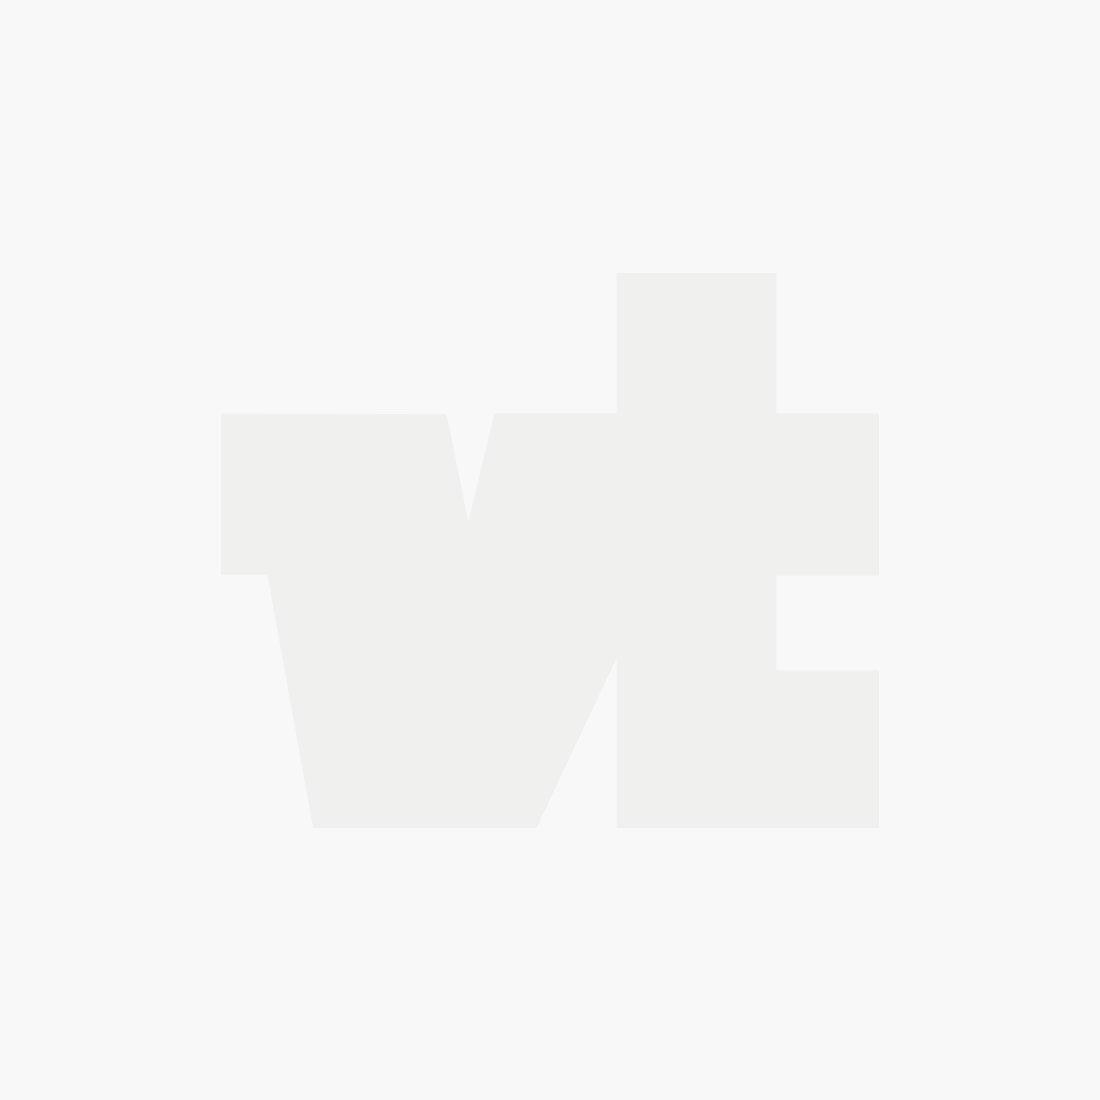 Kris t-shirt cream white